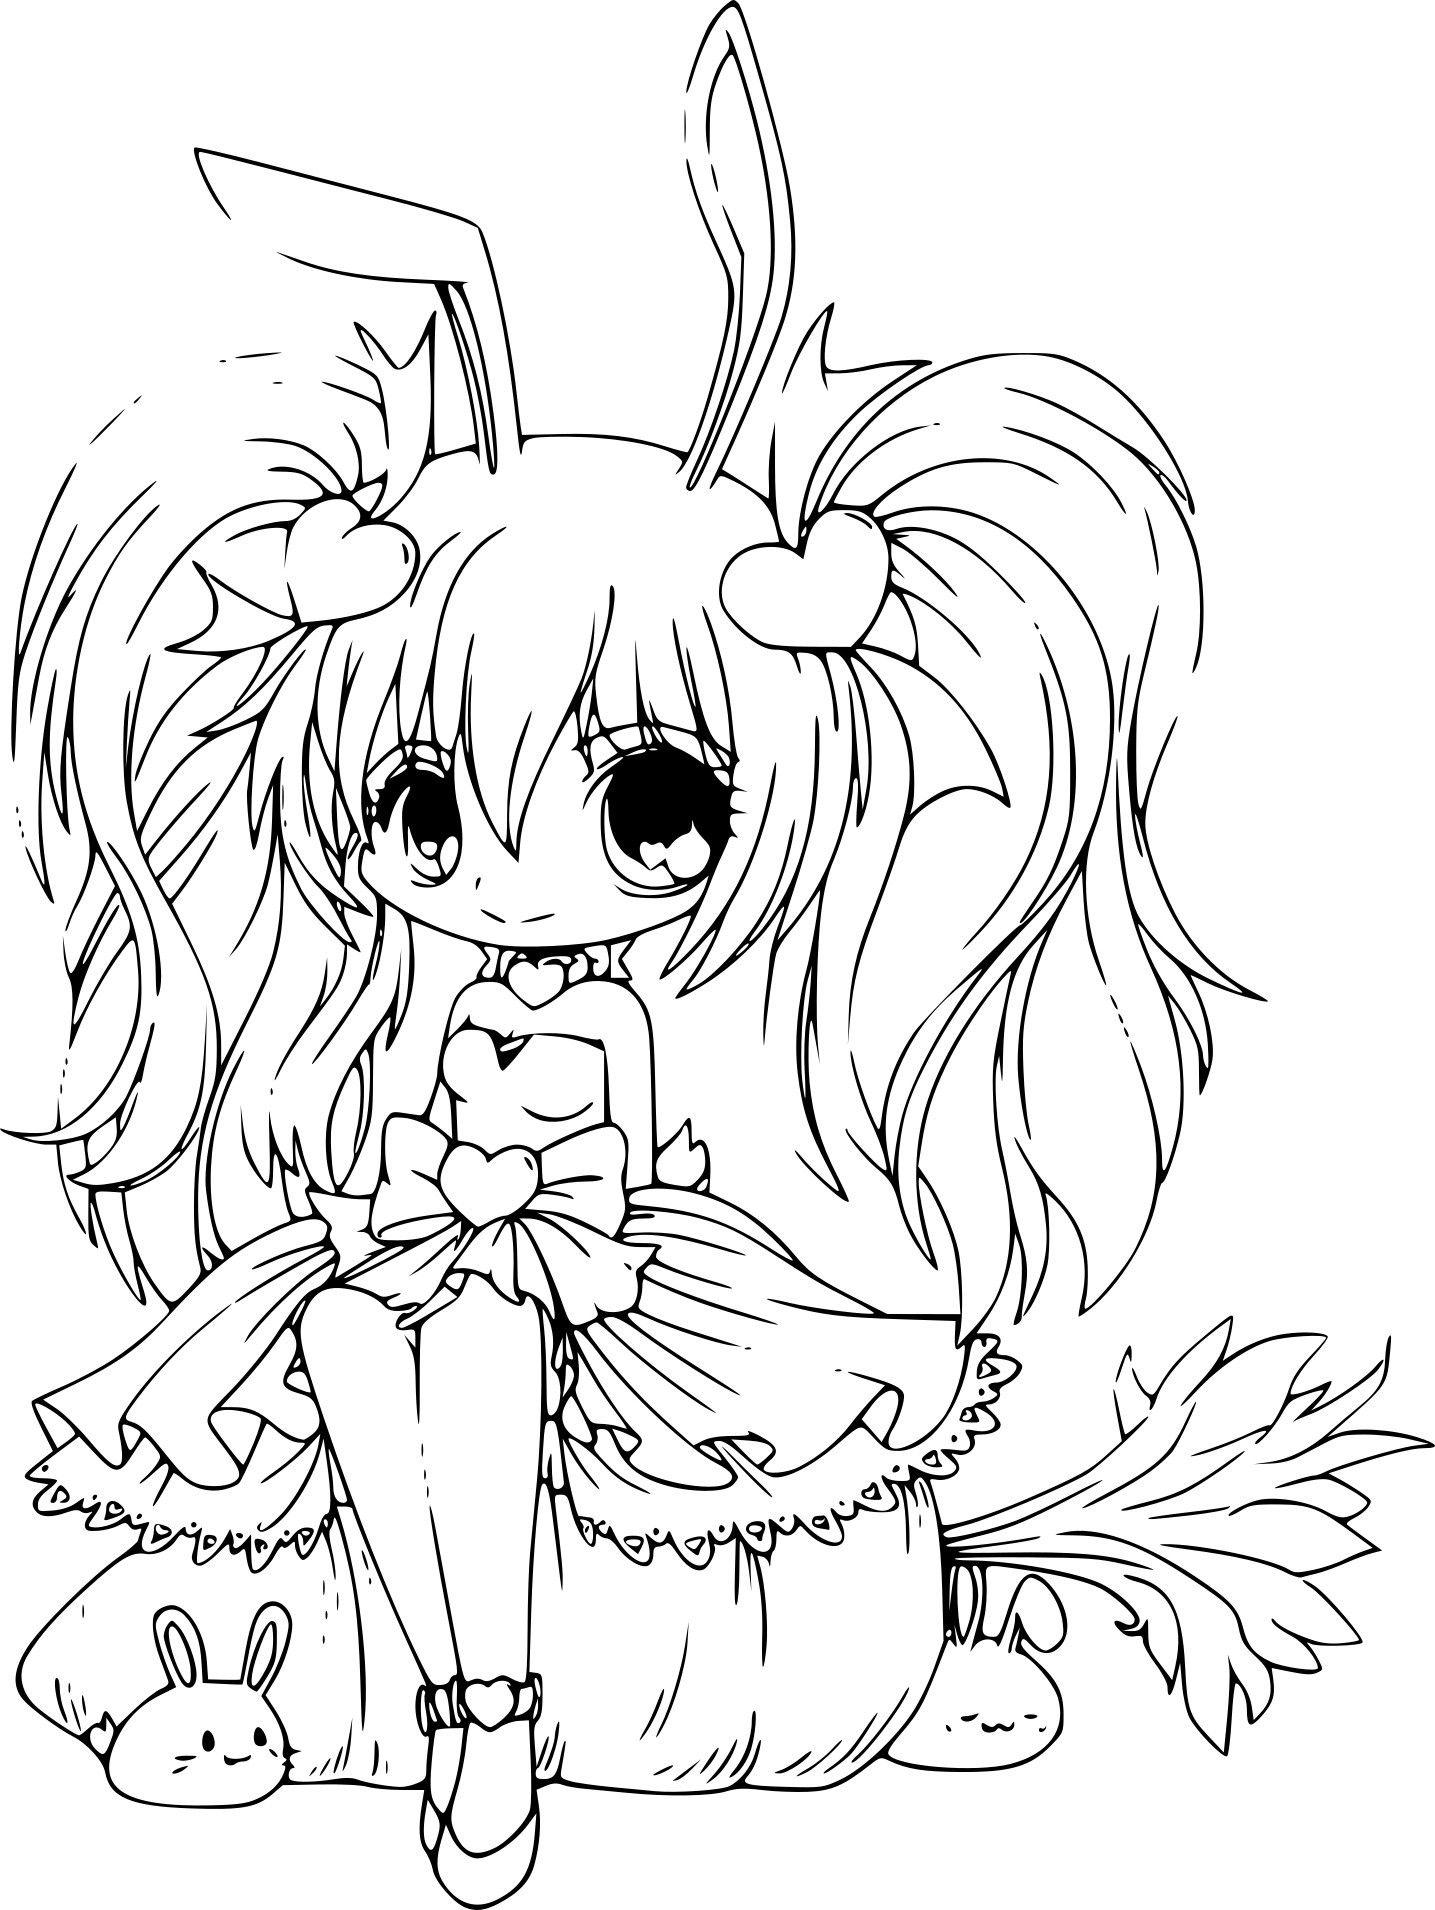 Coloriage kawaii licorne a imprimer unique en ligne manga dessin a imprimer adult coloring - Image licorne ...